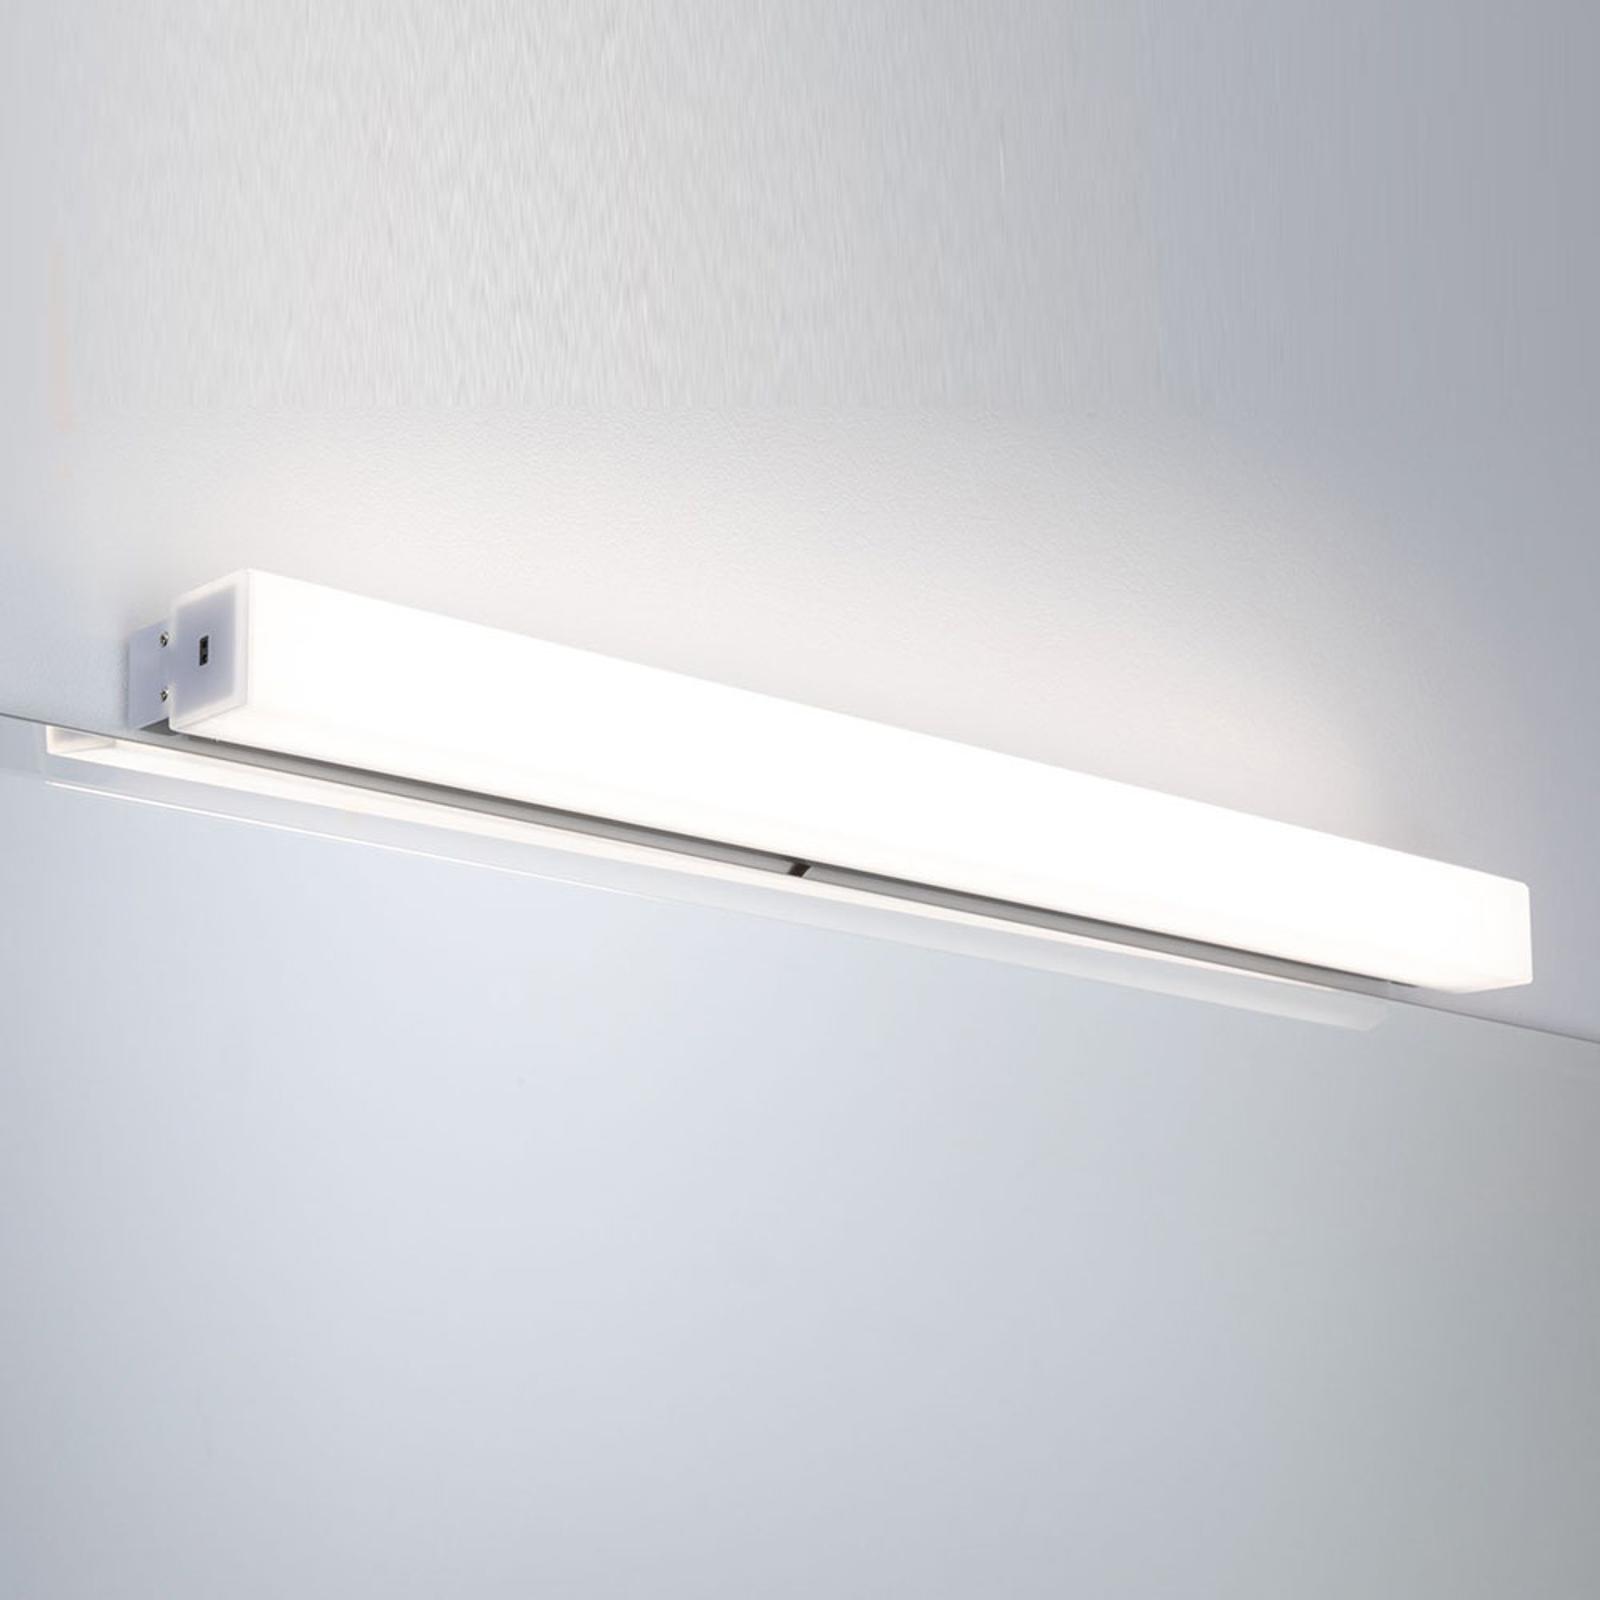 Paulmann HomeSpa Luno LED-speillampe, 60 cm